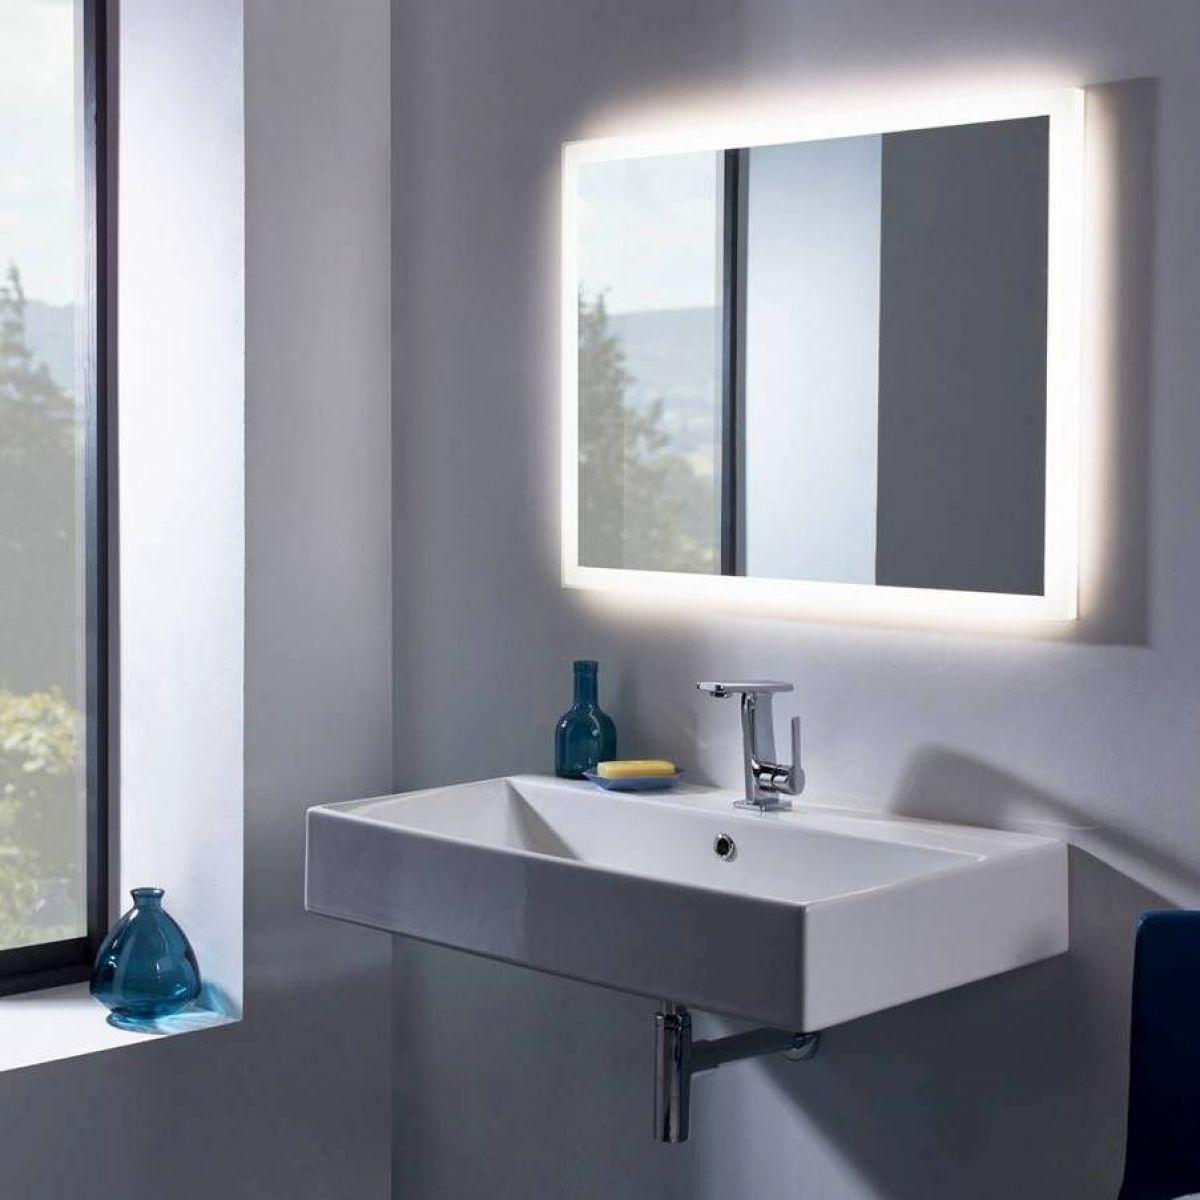 Roper Rhodes Statement Wall Hung Washbasin Uk Bathrooms